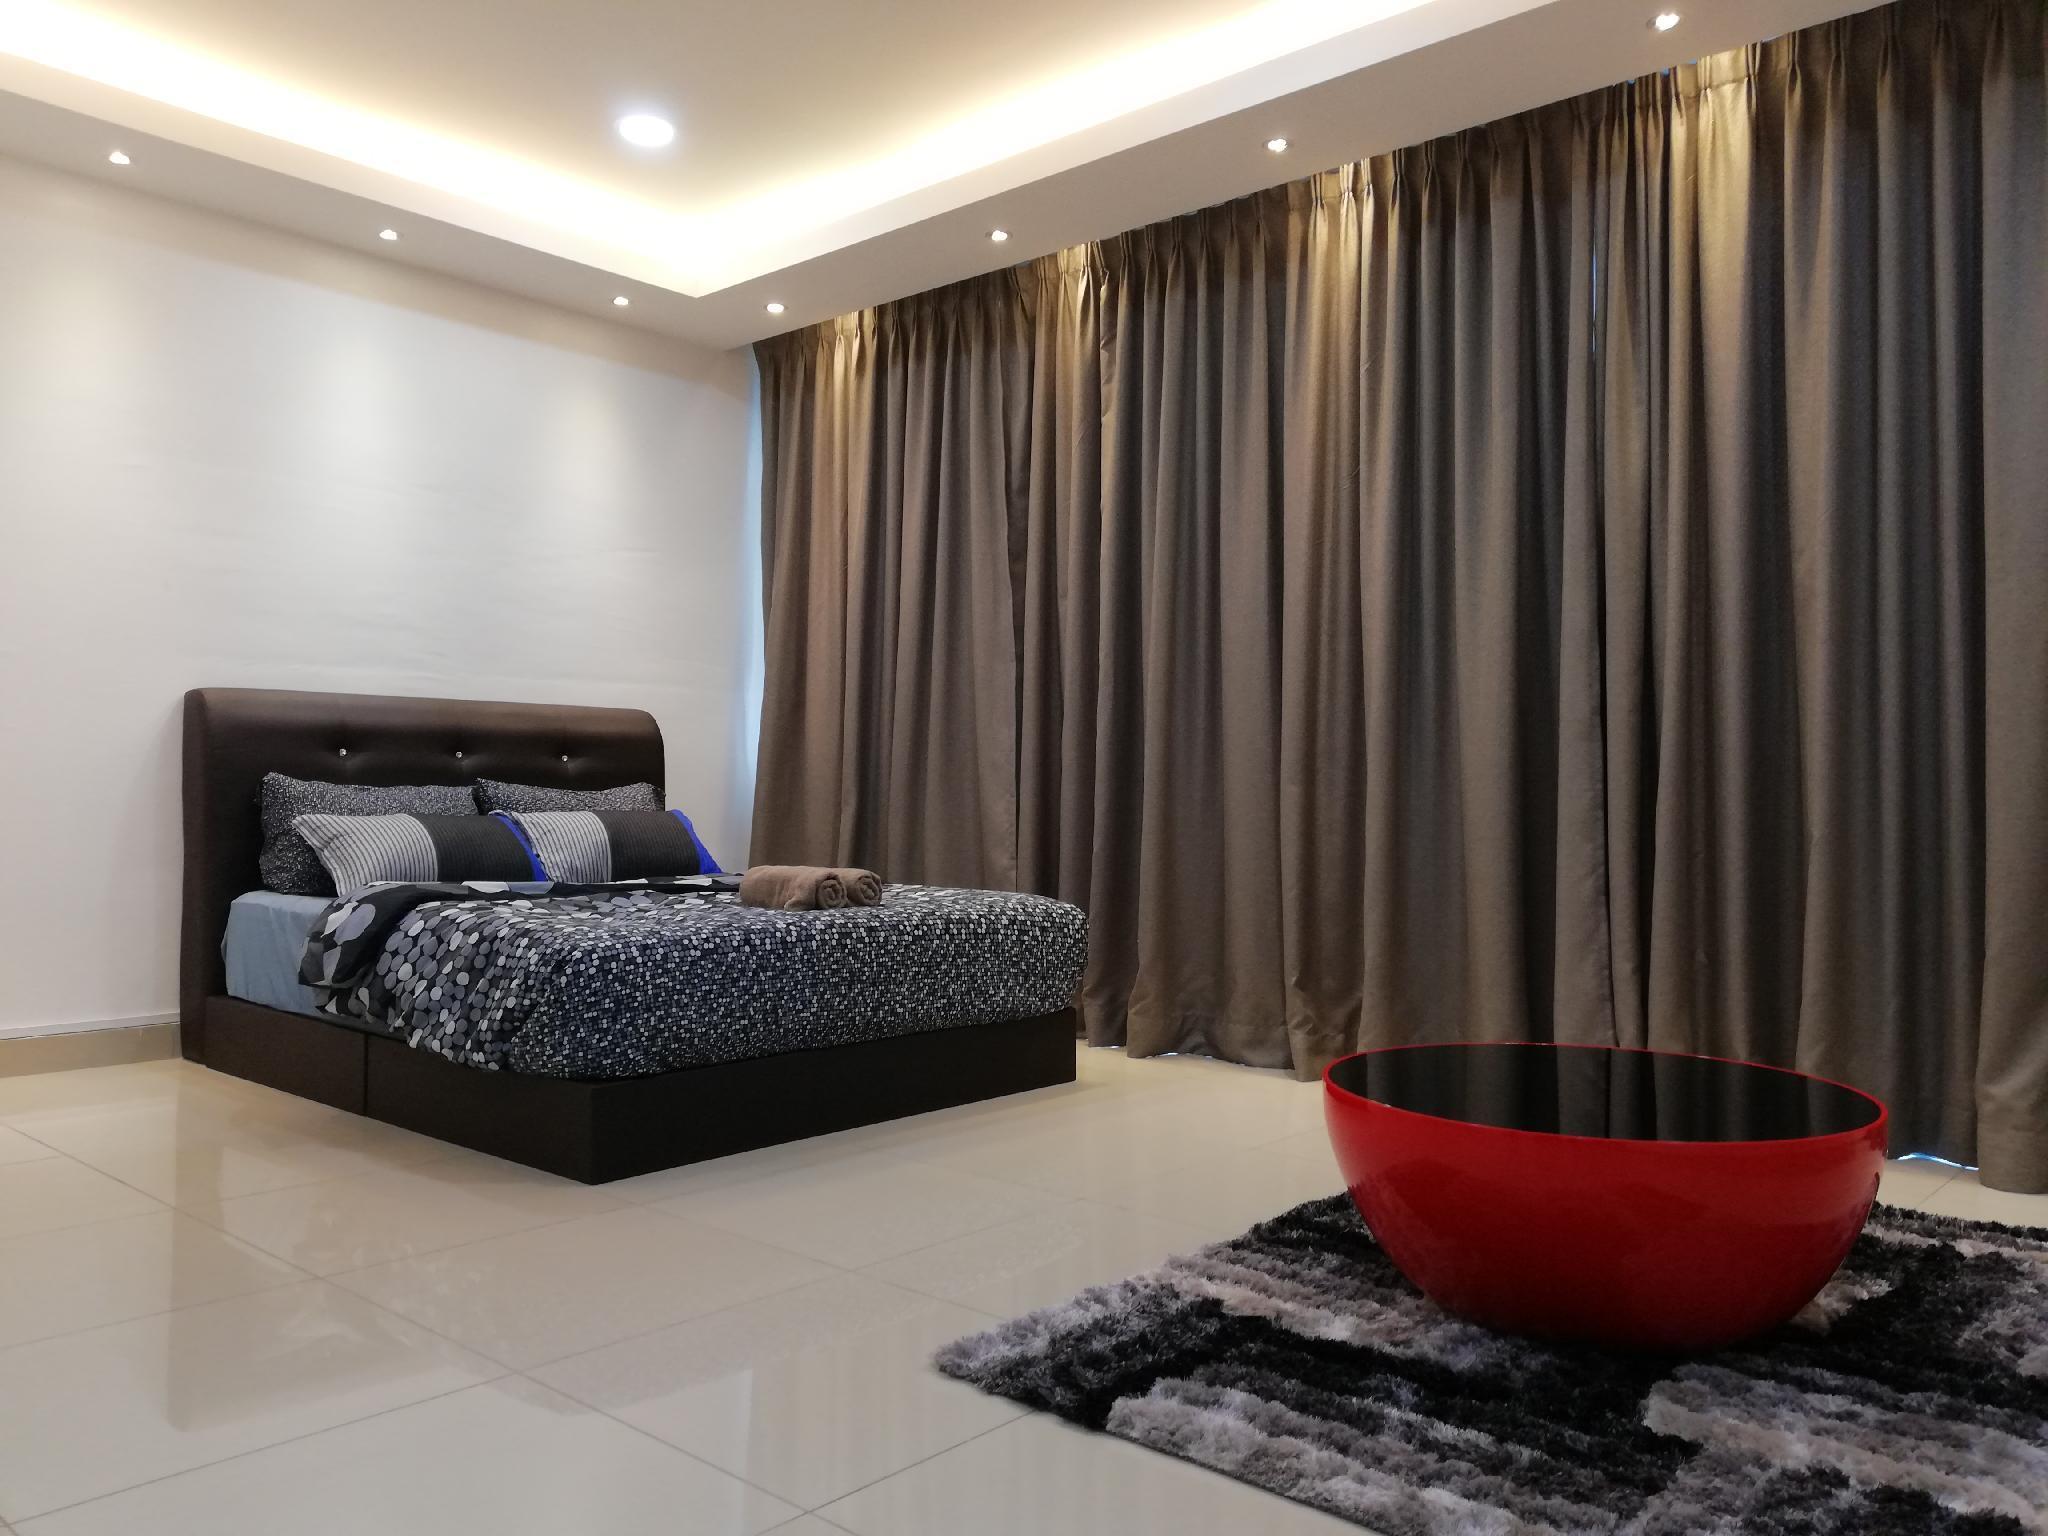 ROMANCE PEANUT HOUSE @TREFOIL SETIA ALAM, Kuala Lumpur